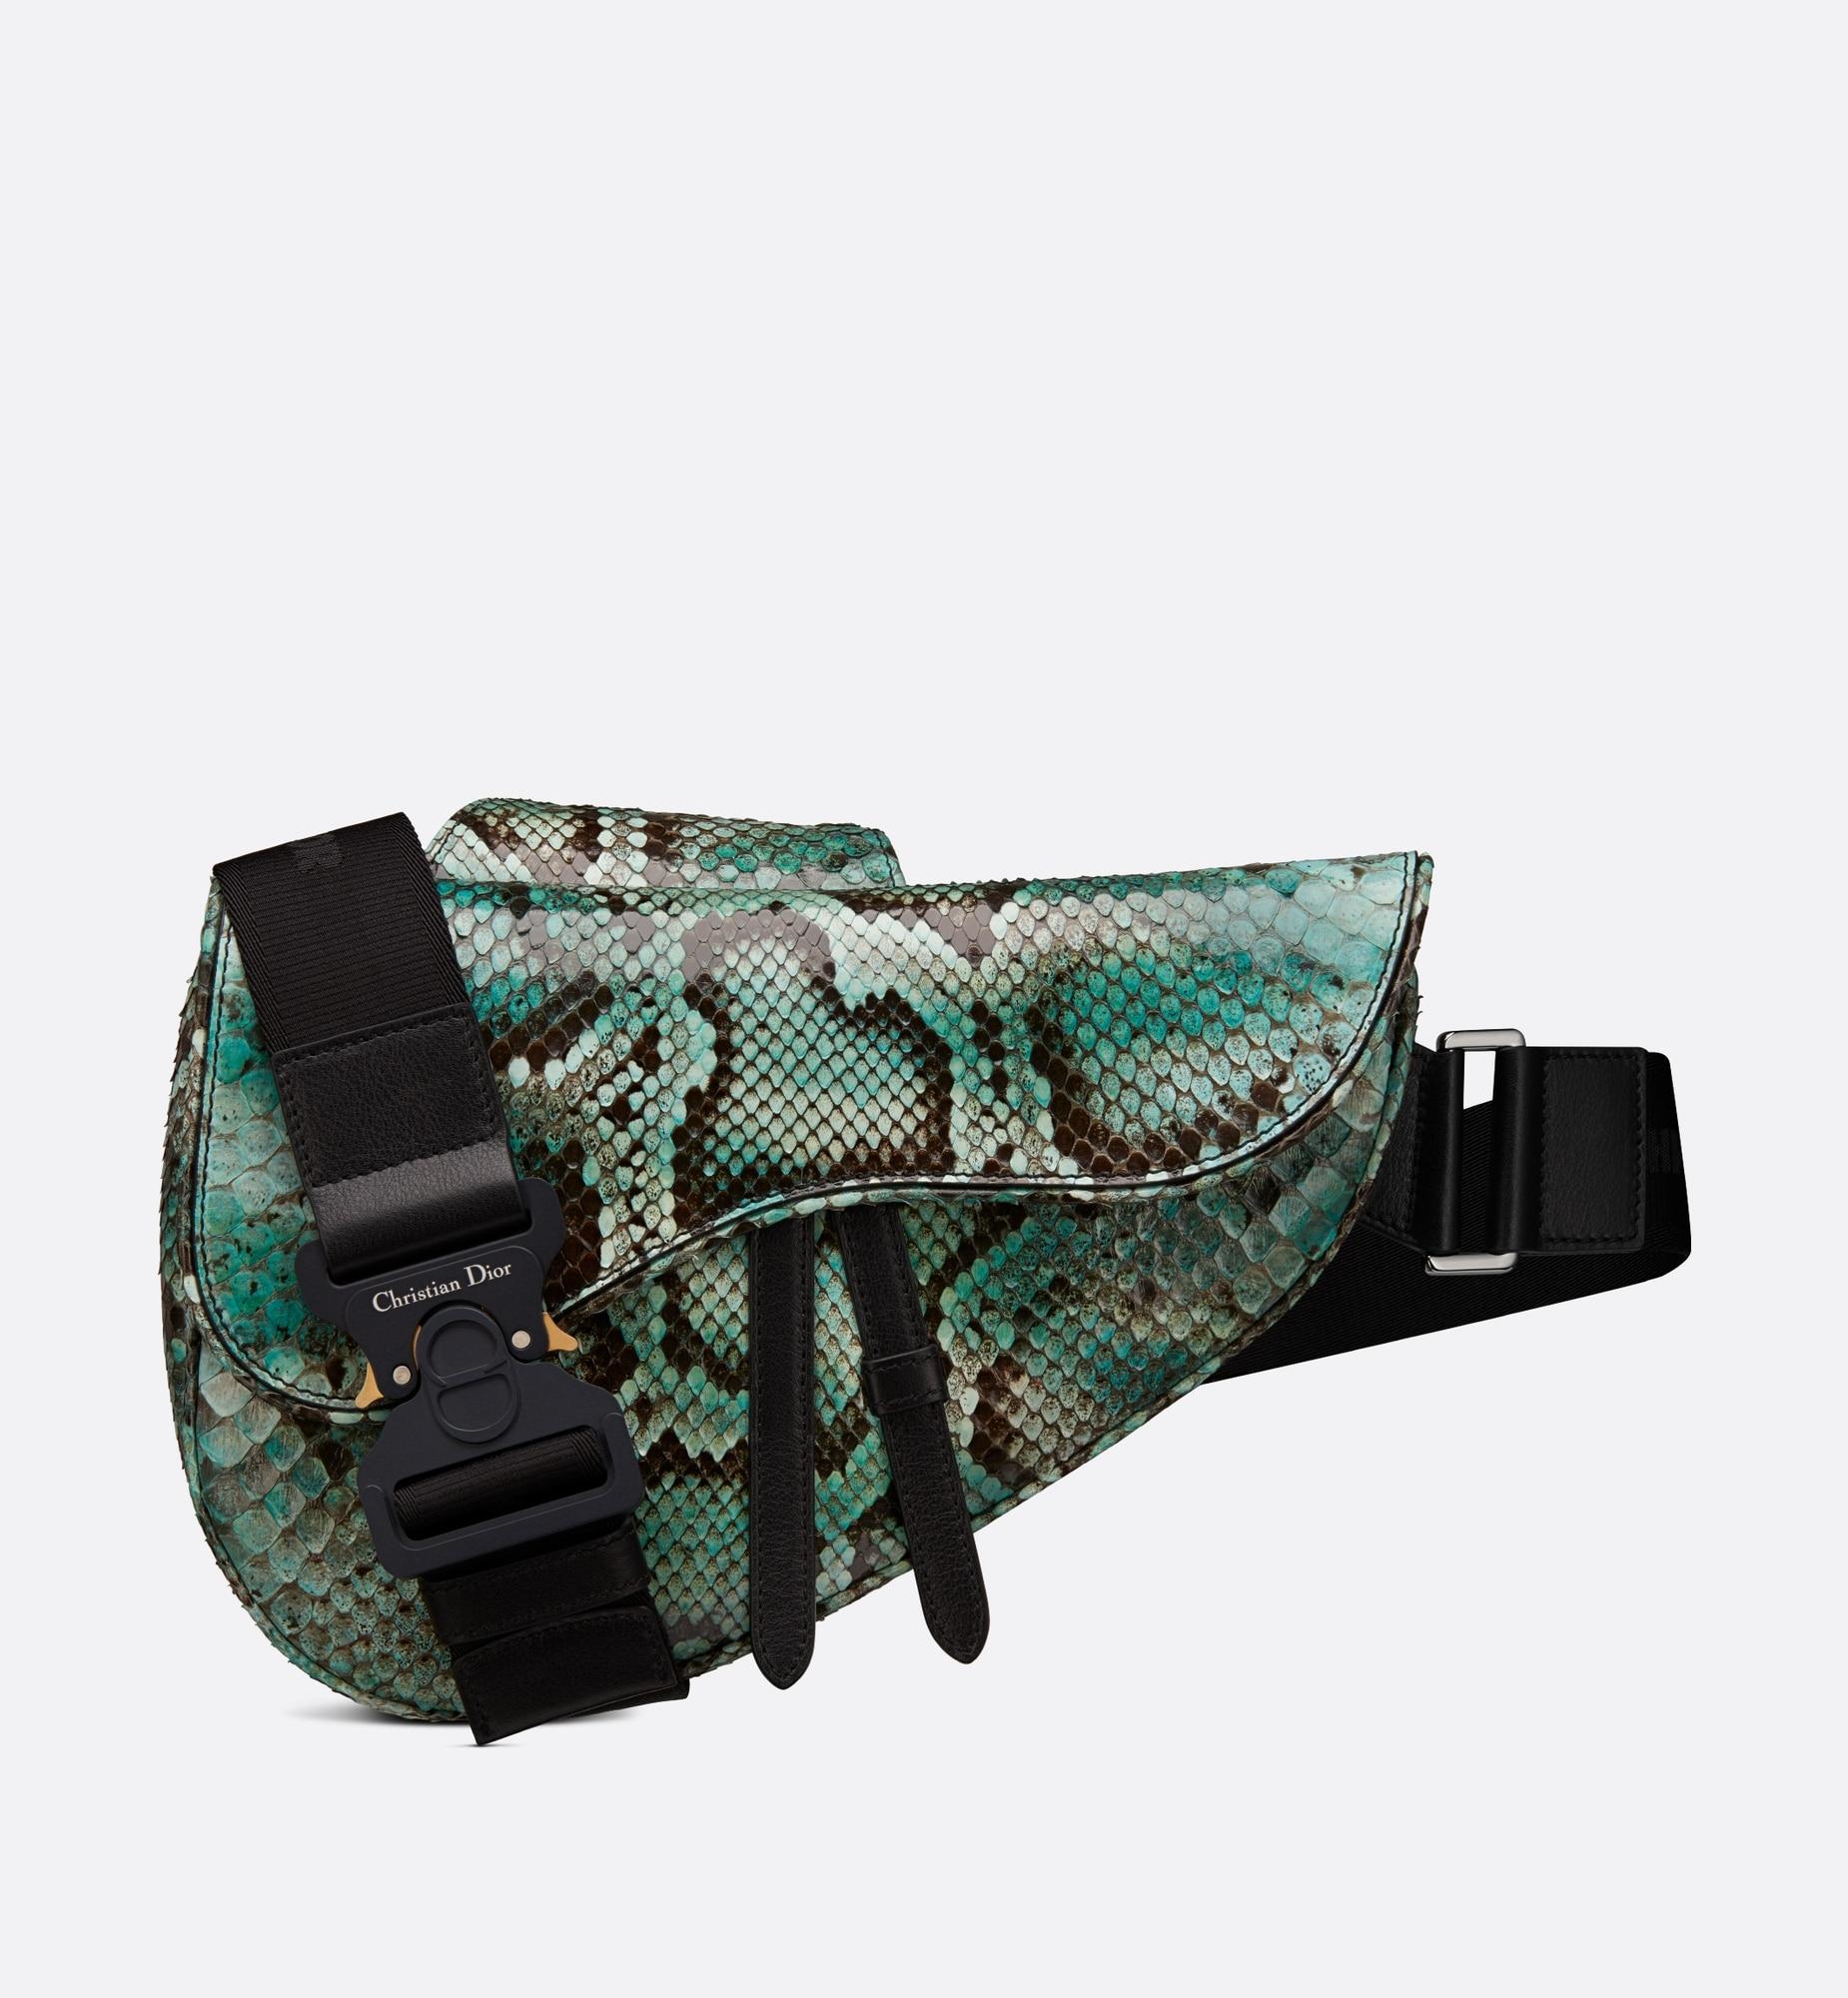 Saddle Bag Front view